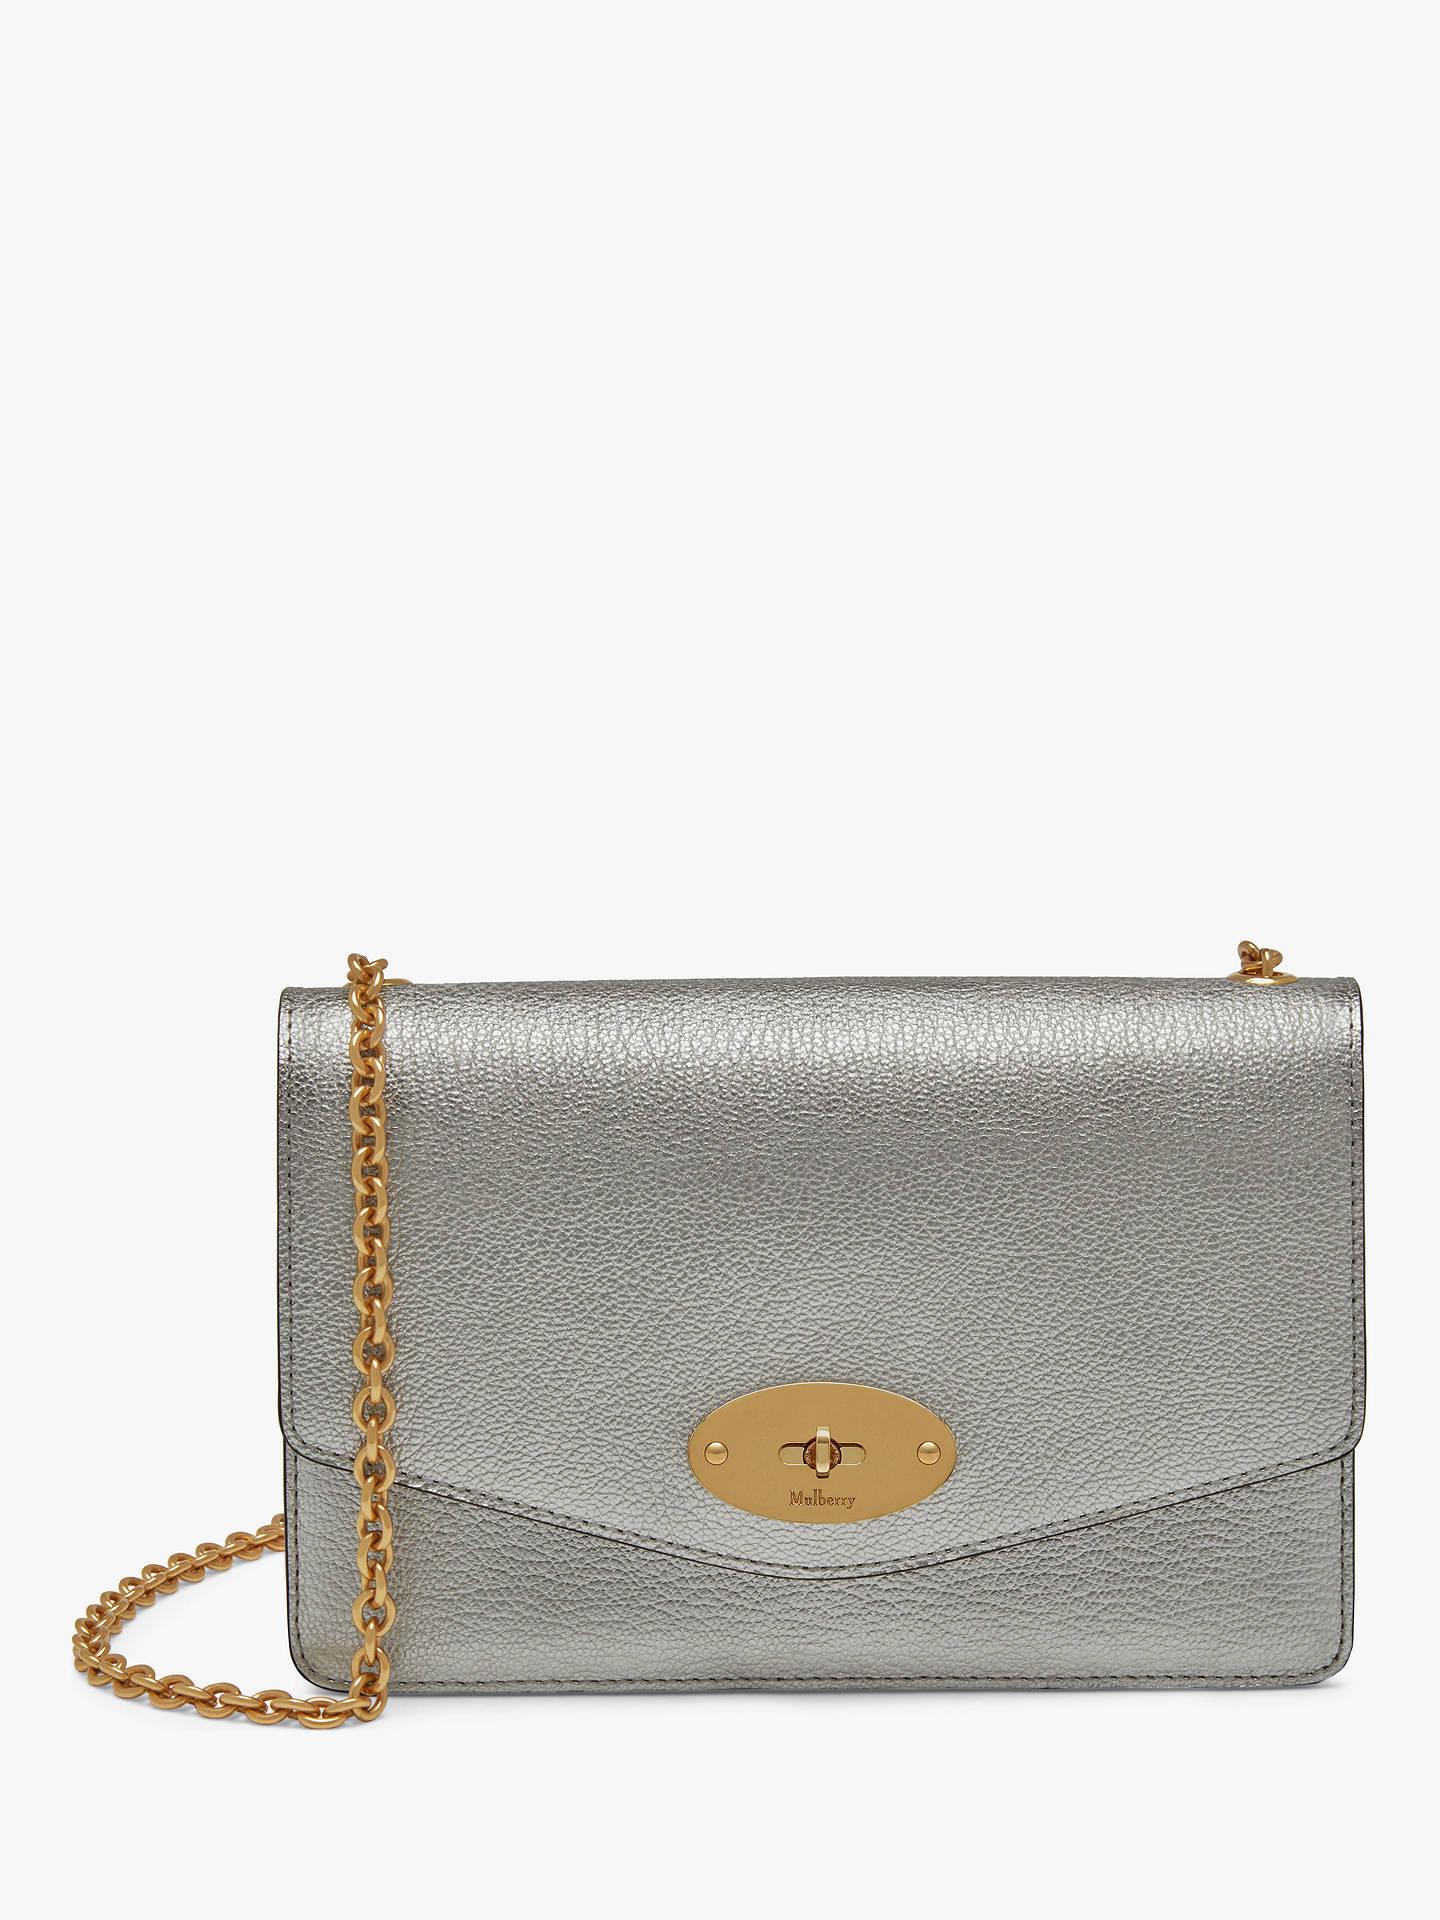 66d5b31e3a7c Mulberry Small Darley Metallic Printed Calf Leather Cross Body Bag ...